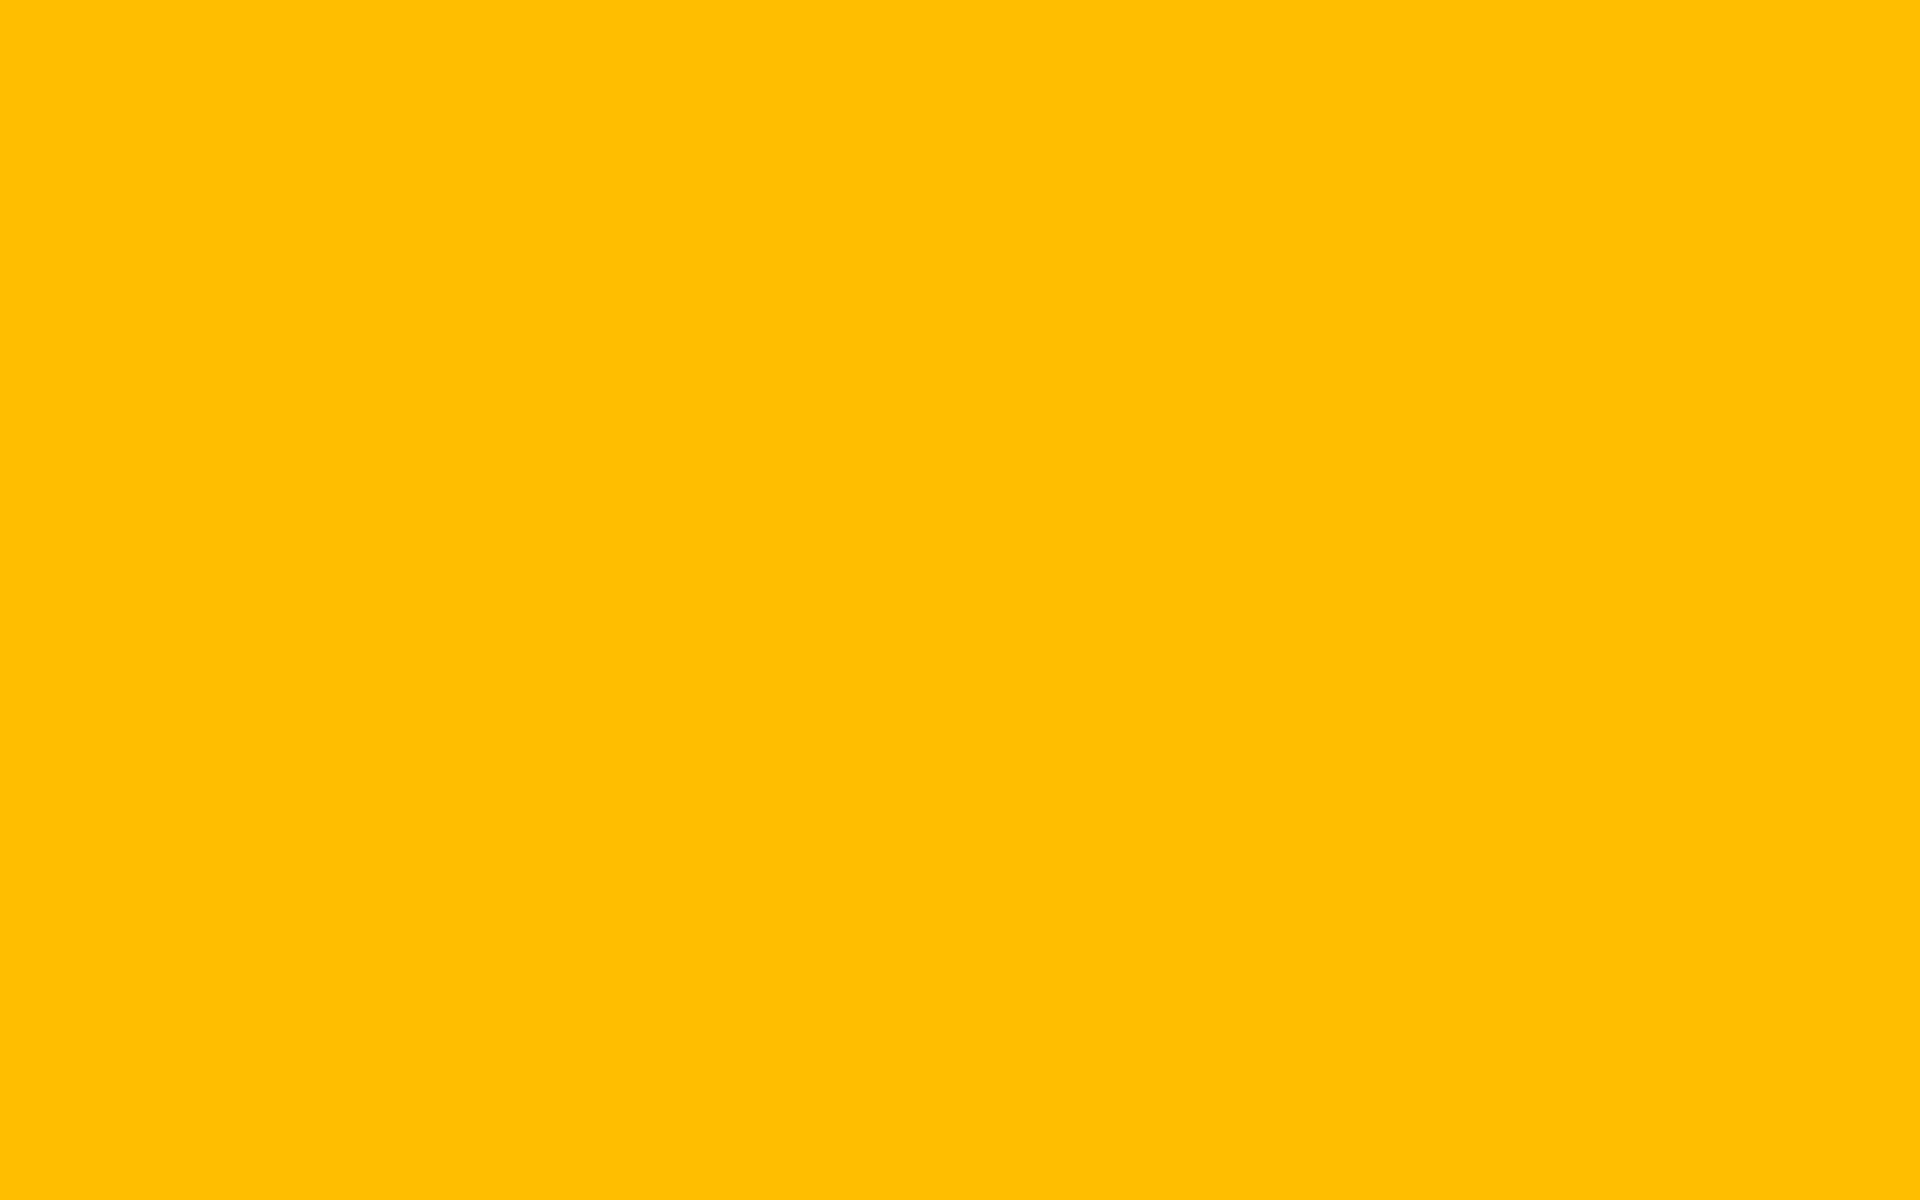 1920x1200 Fluorescent Orange Solid Color Background